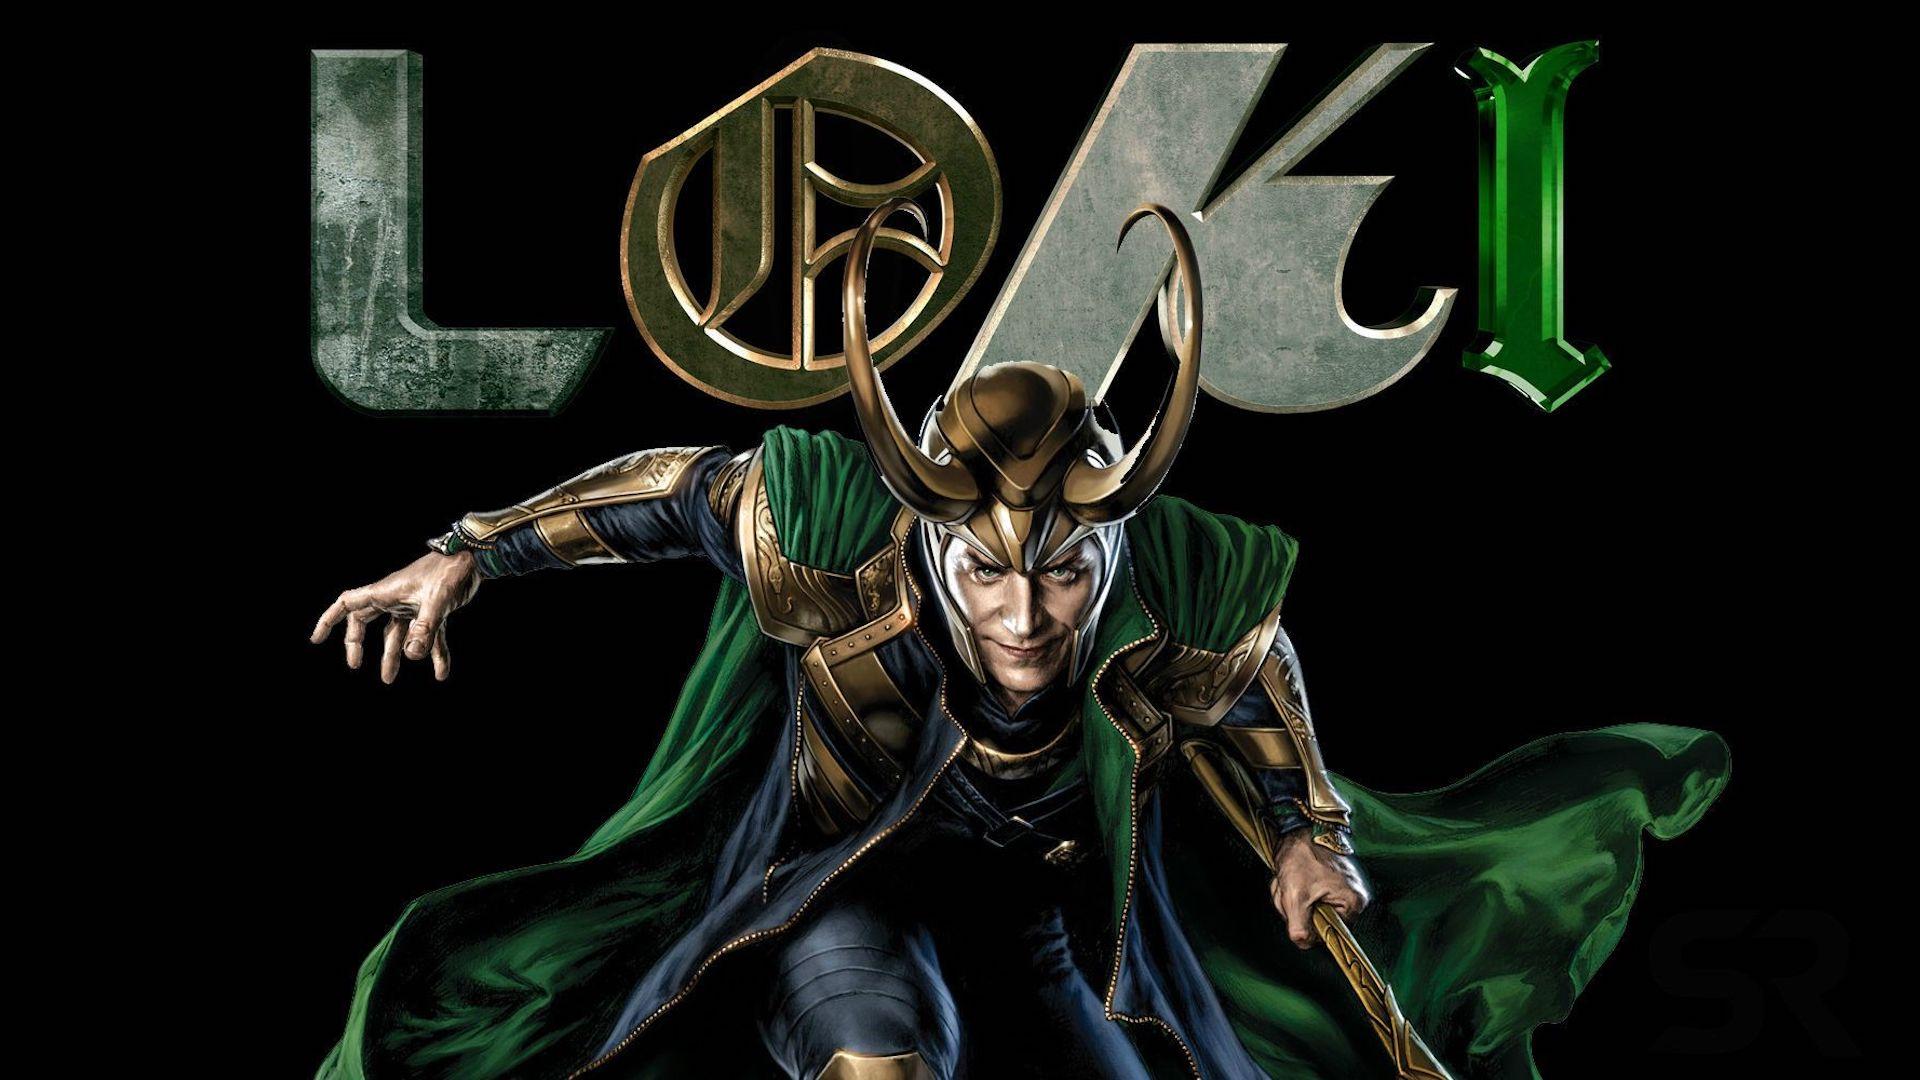 La serie Loki tendrá temporada 2 en Disney Plus. ¿Y Falcon?